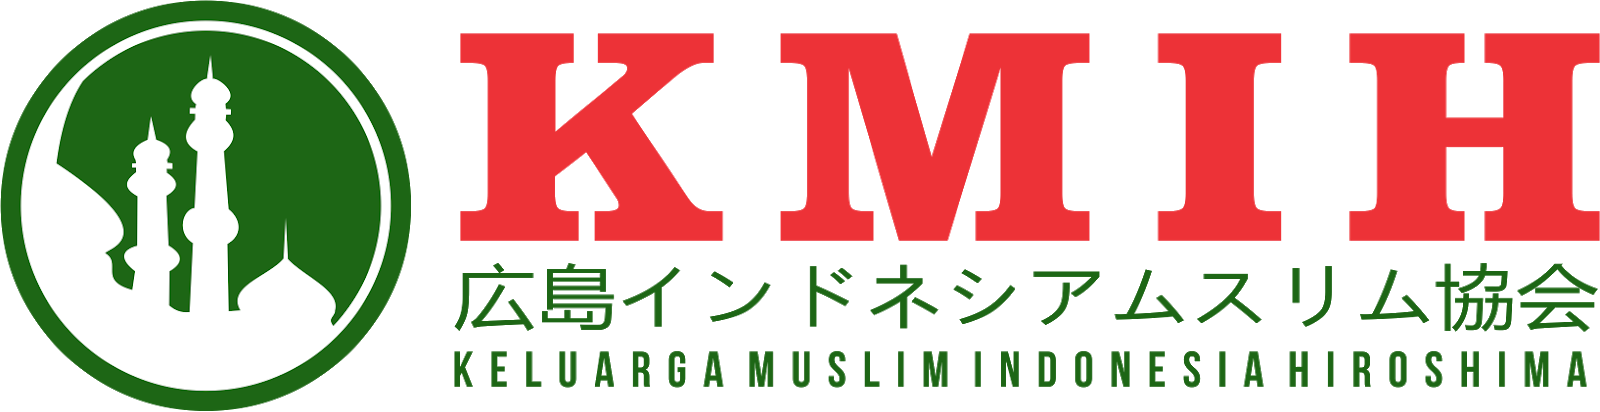 Keluarga Muslim Indonesia Hiroshima